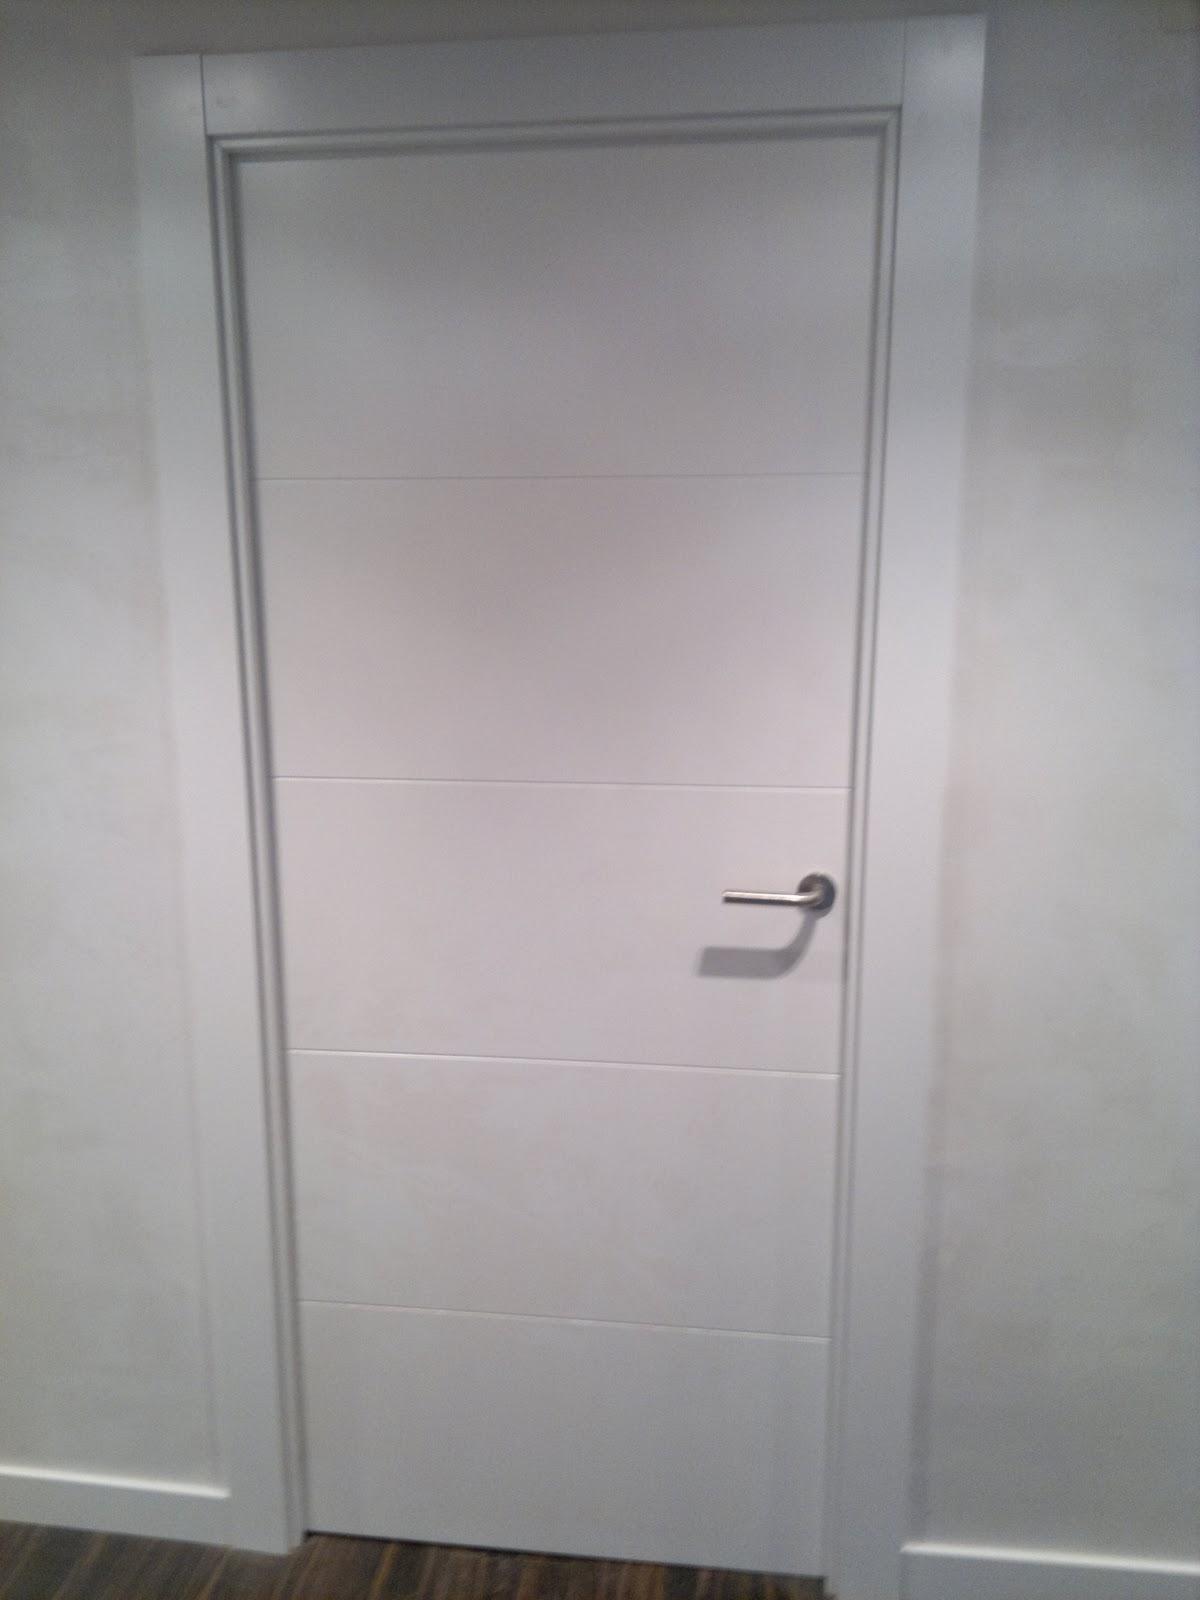 Ebanisteria carpinteria manuel perez zaragoza puertas lacadas en blanco zaragoza - Puertas lacadas en blanco opiniones ...